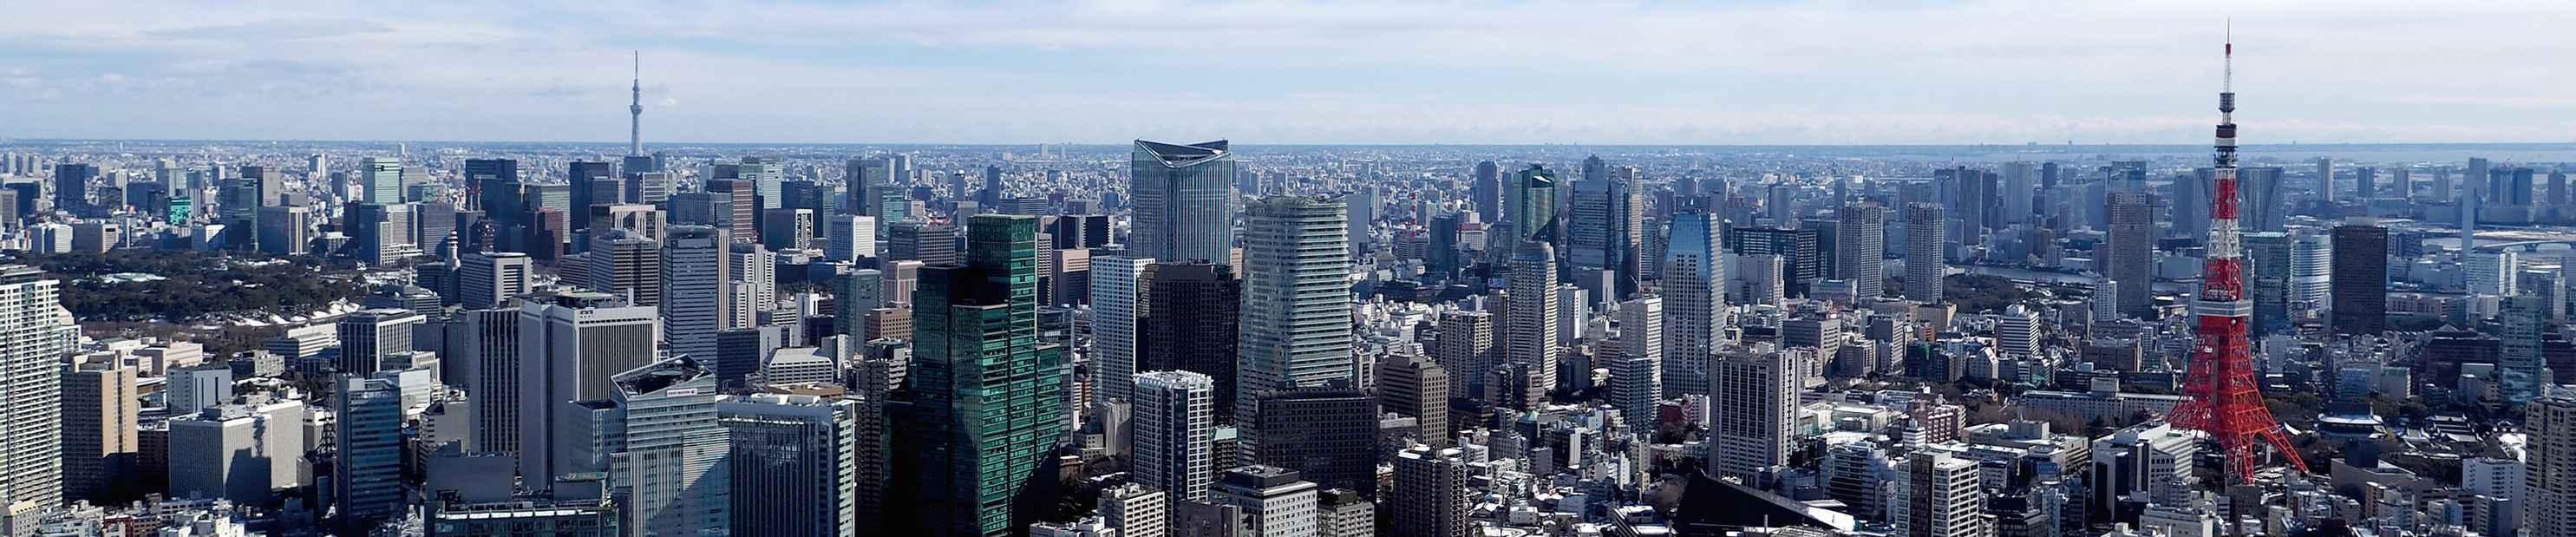 sky city tokyo progress